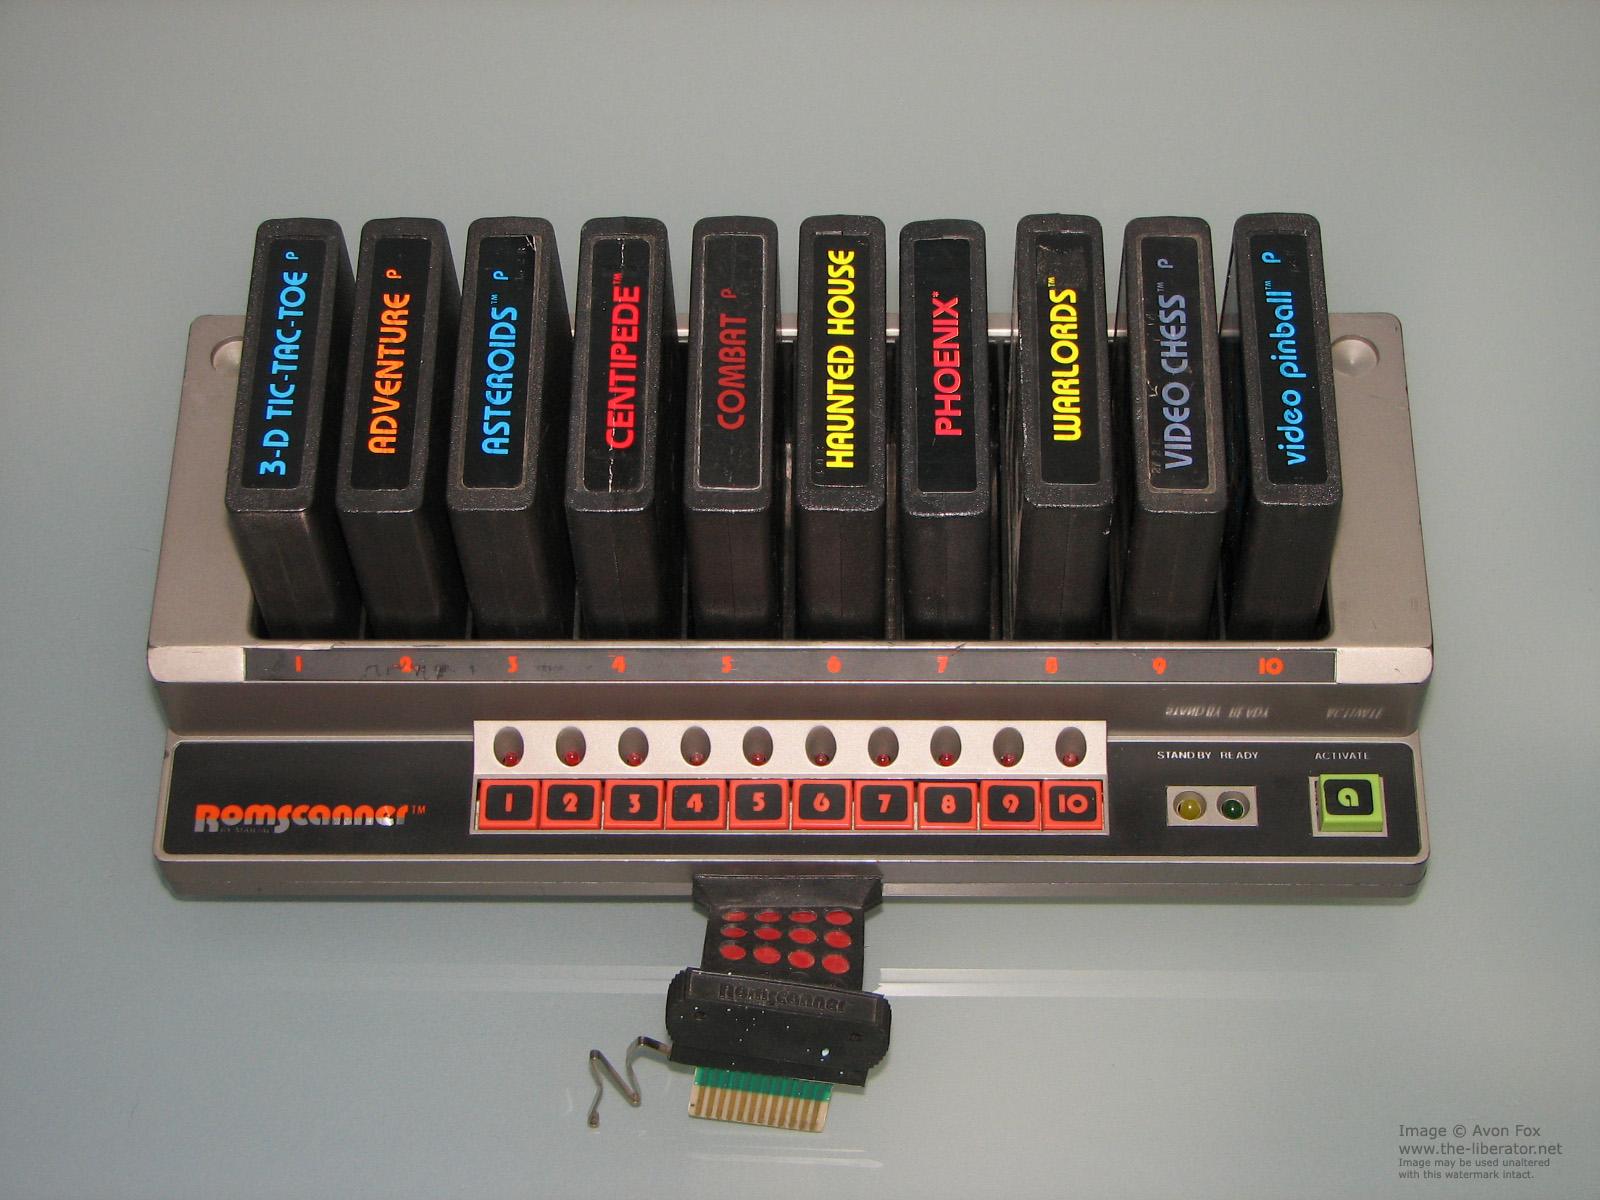 http://www.the-liberator.net/site-files/retro-games/hardware/Atari-2600/atari-2600-rom-scanner-by-marjac-1983-rev-d/Atari-2600-ROM-Scanner-by-MARJAC-1983-Rev-D-001a.JPG